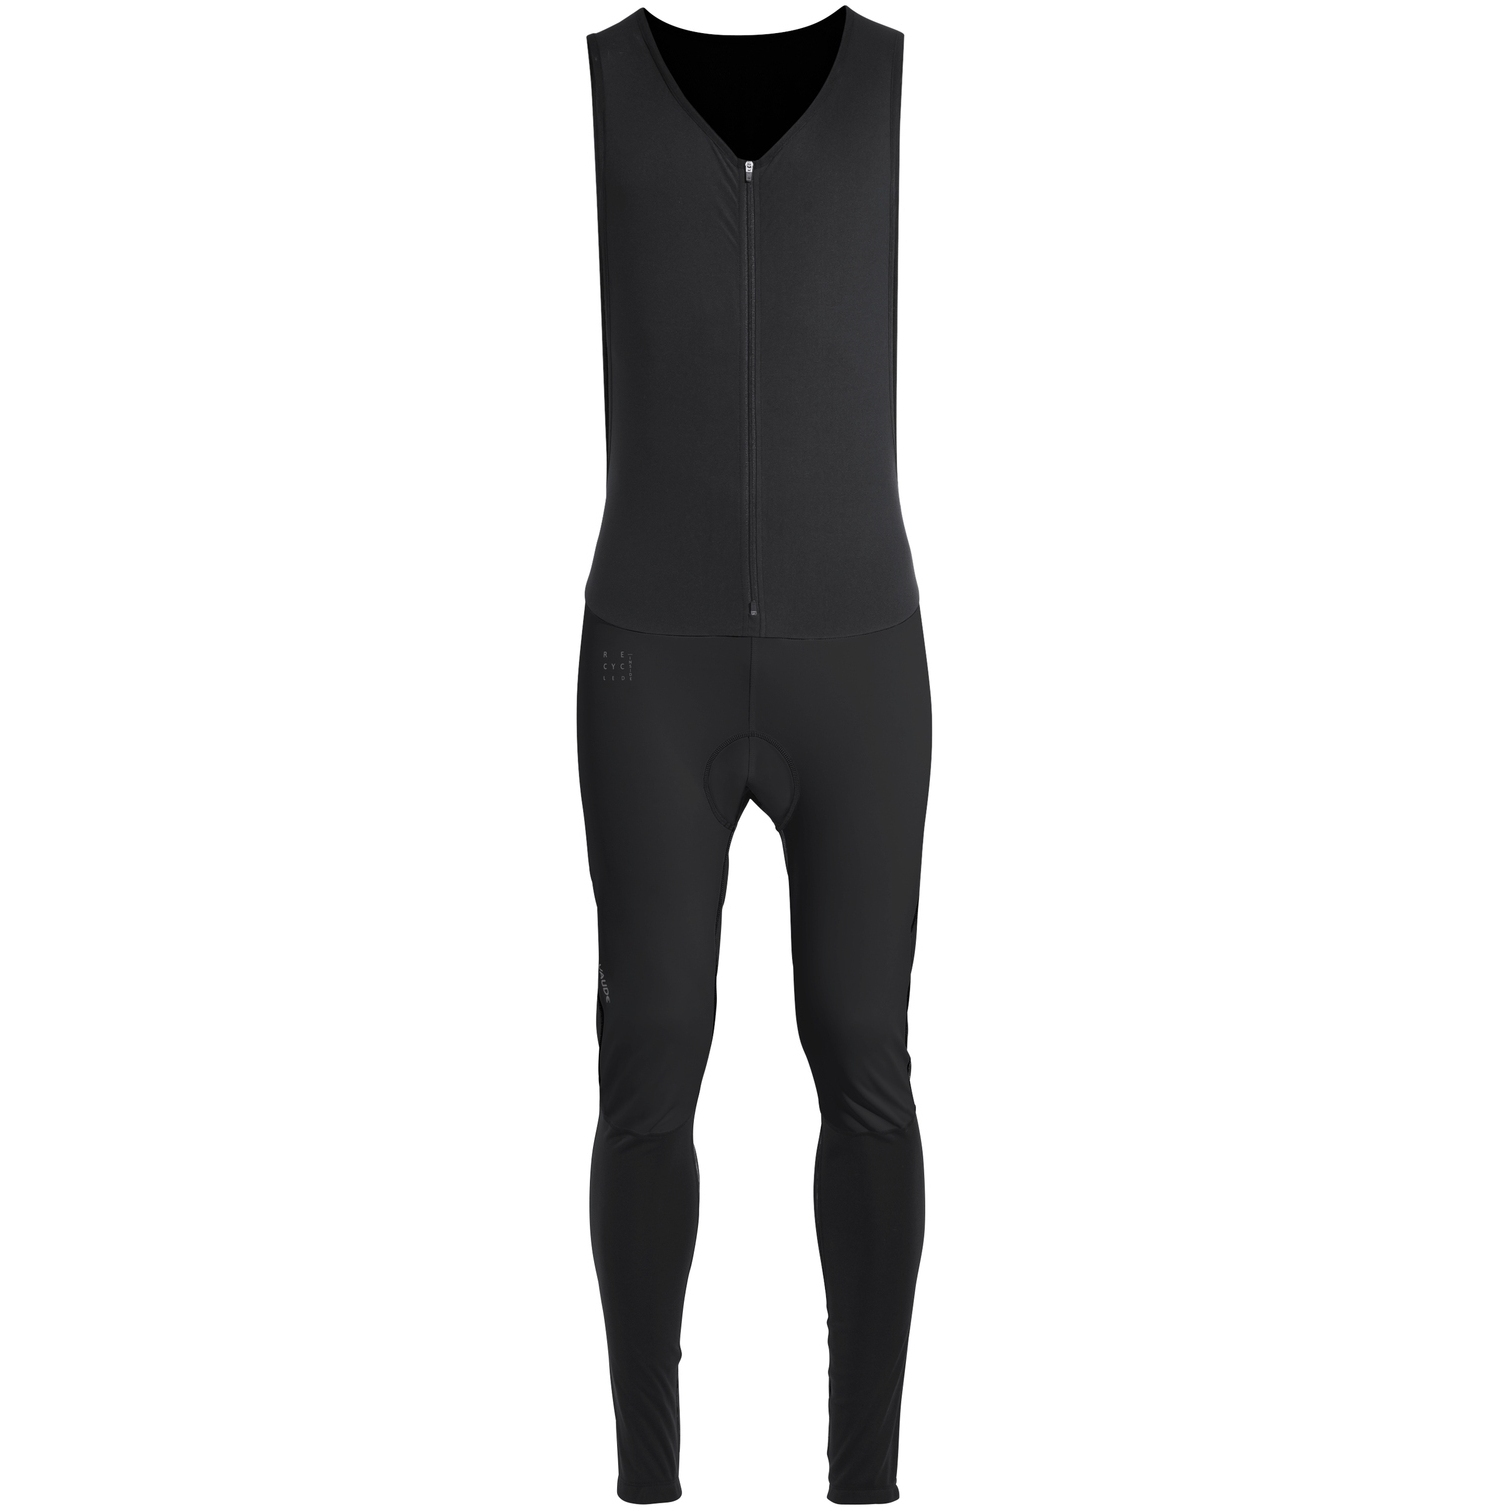 Vaude Men's Posta Warm Bib Tights - black